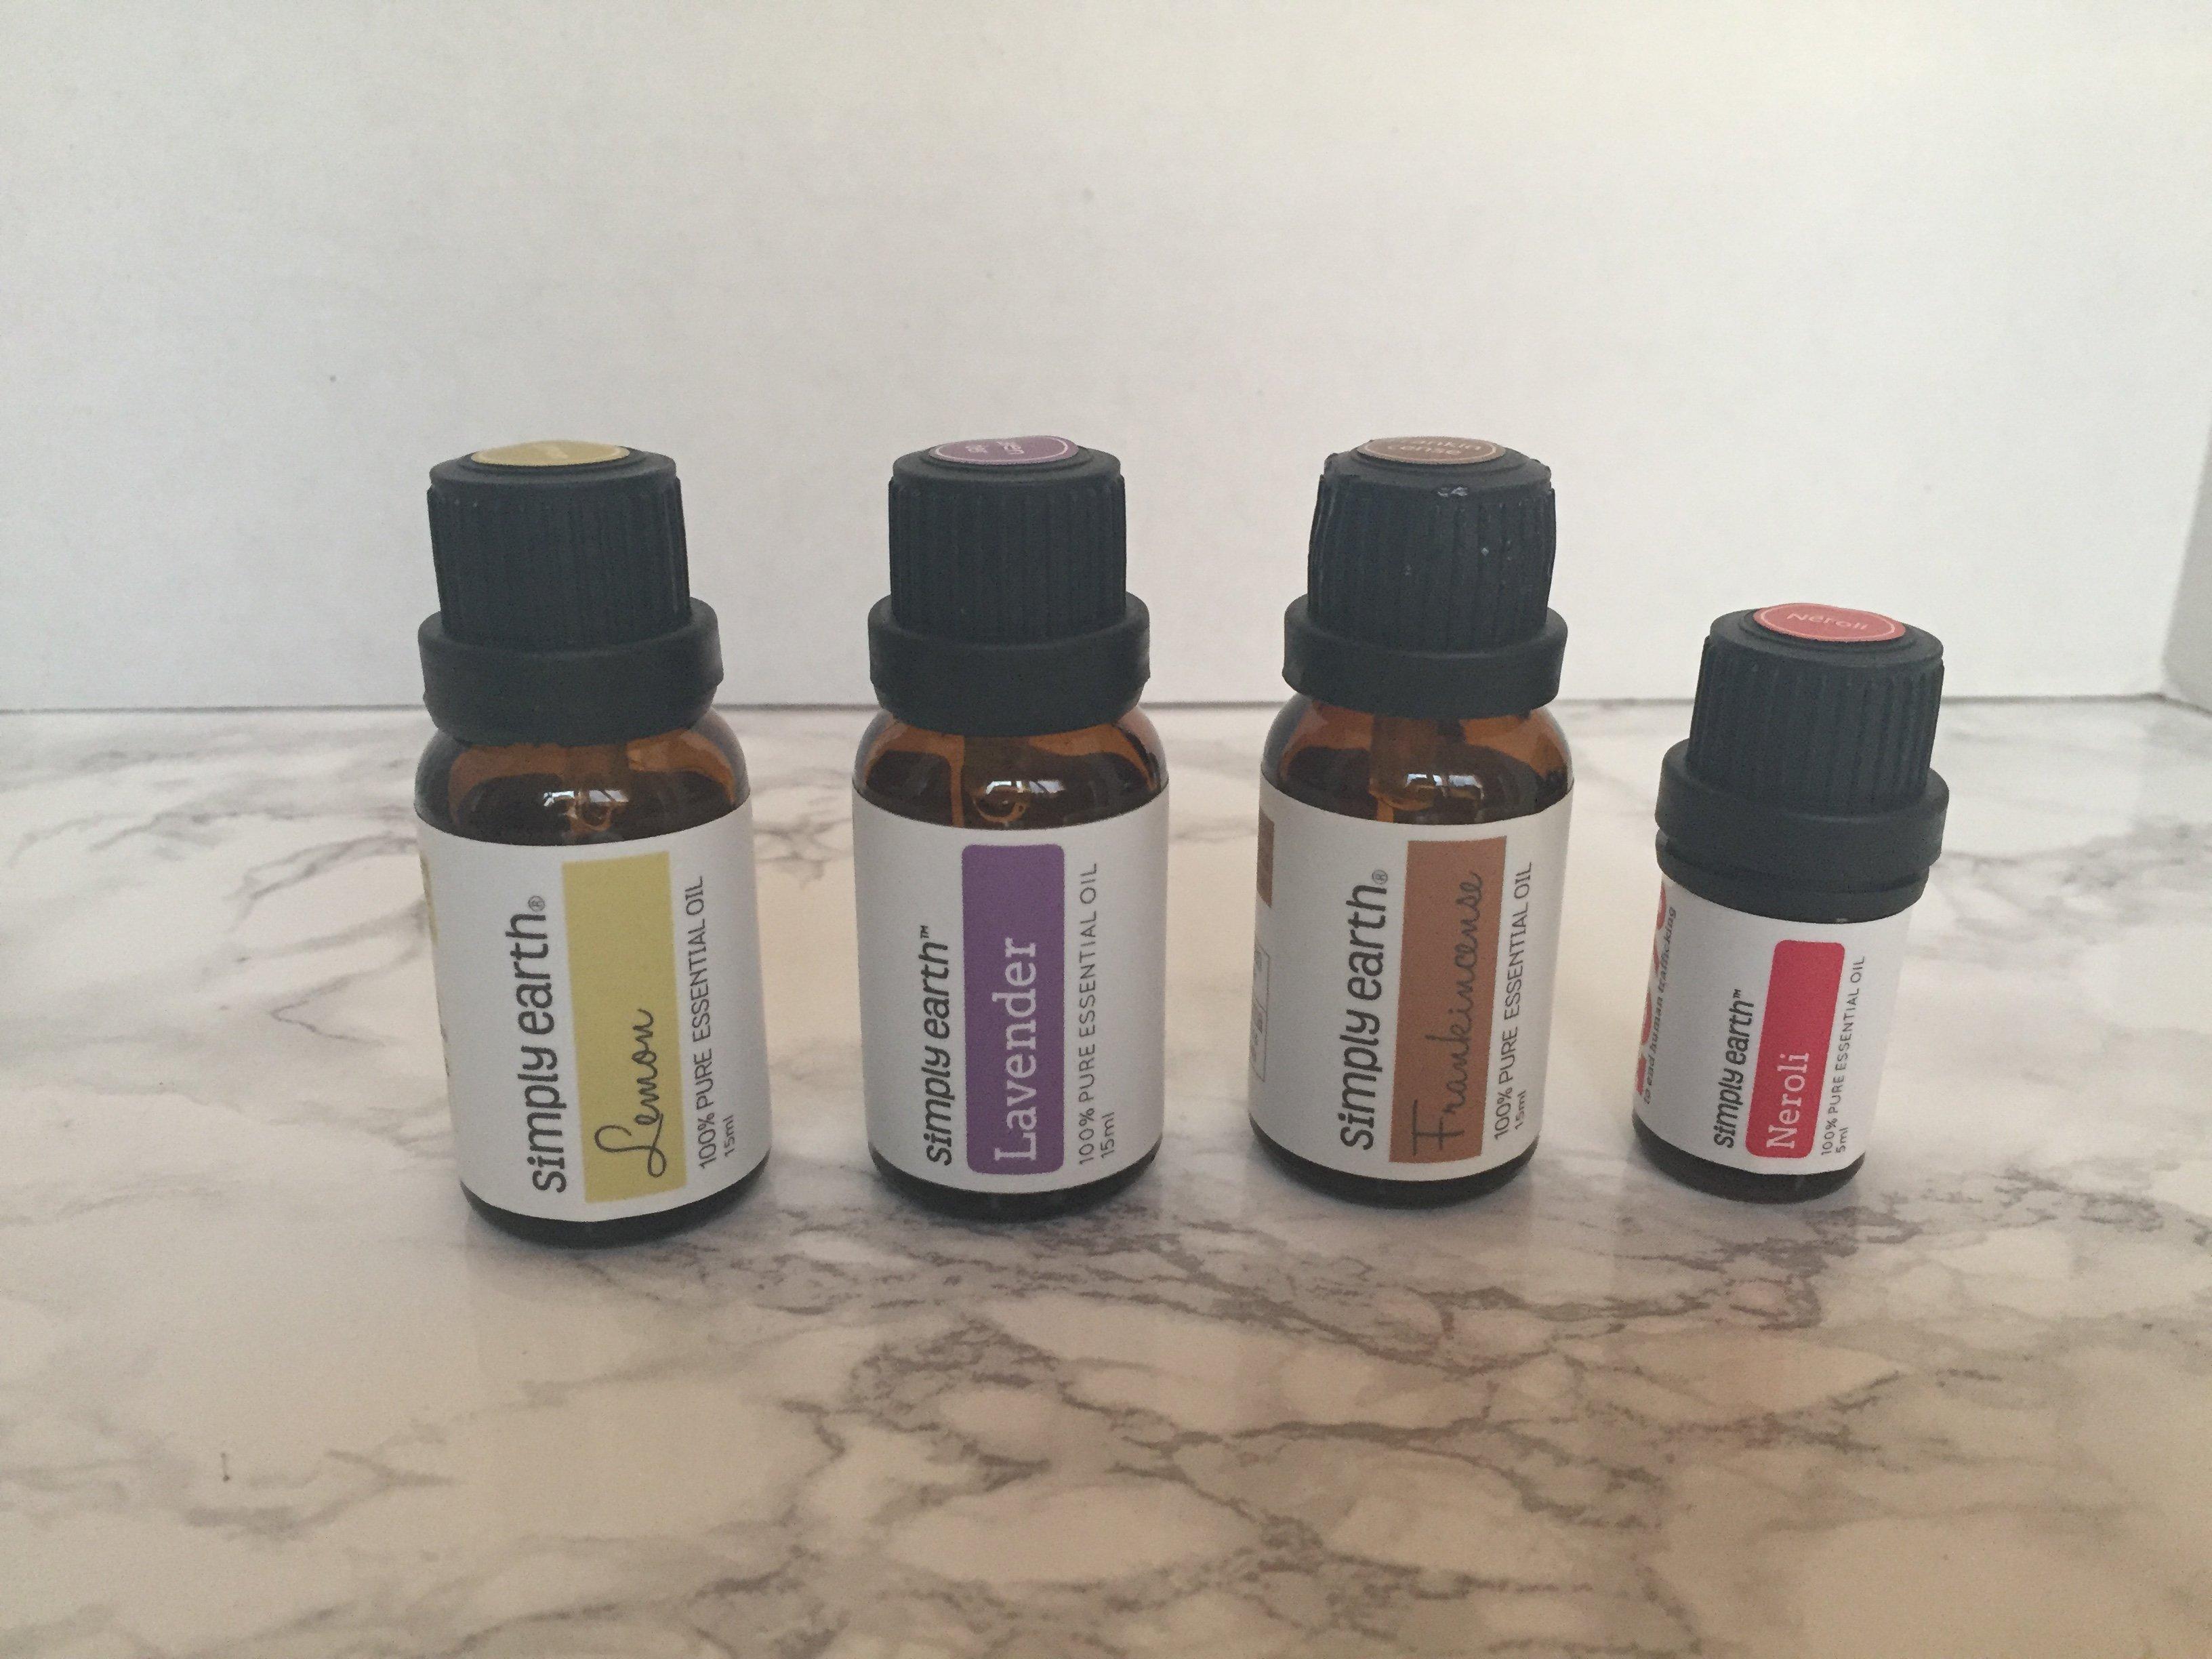 stretch mark serum with Lemon, Lavender, Frankincense, and Neroli essential oils.